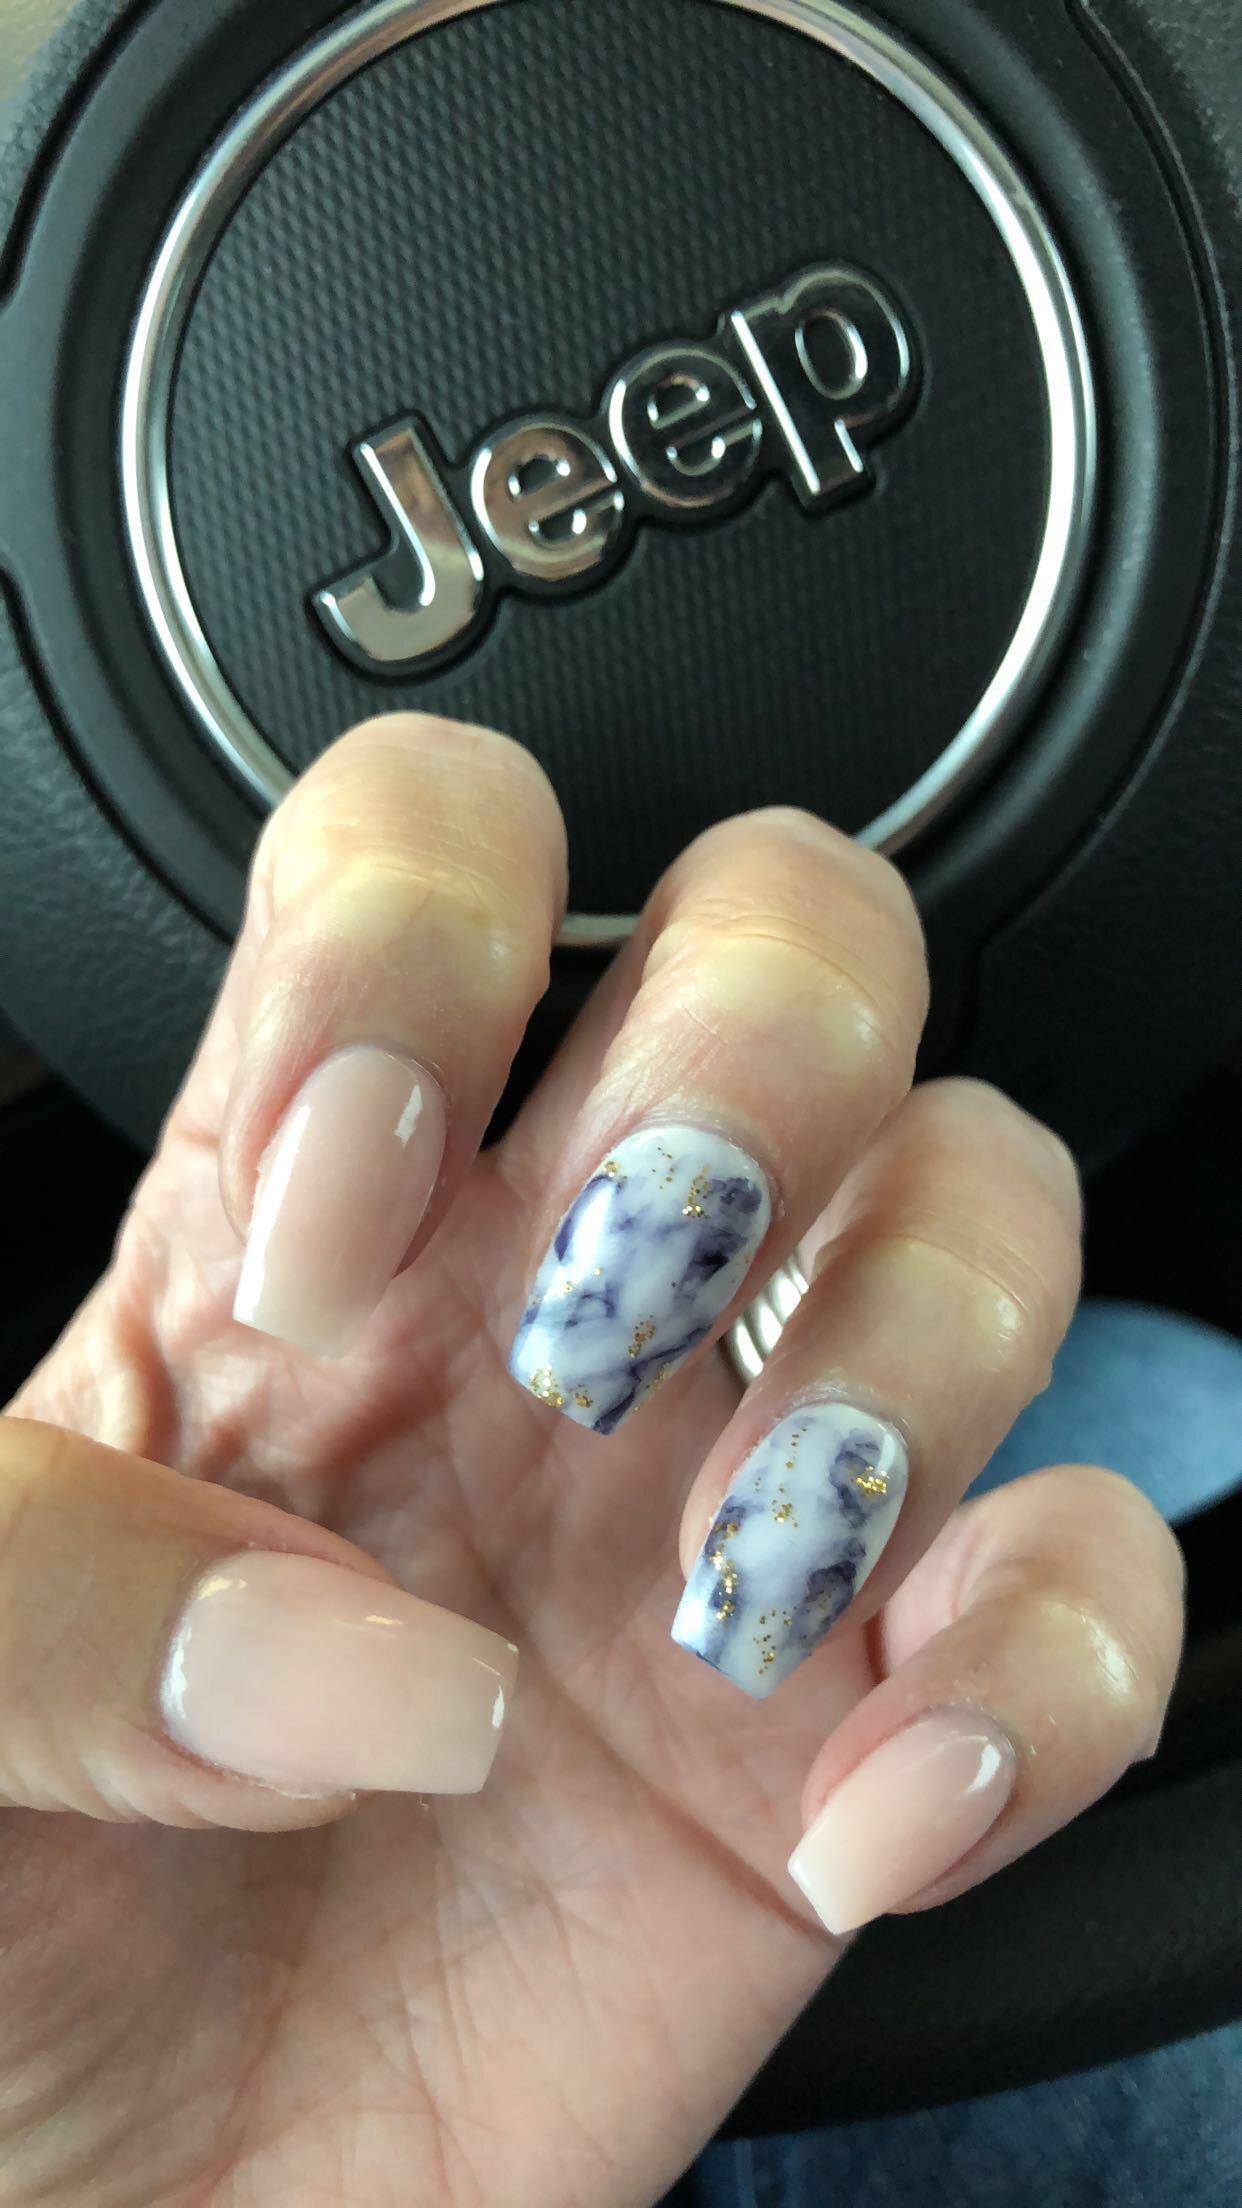 Kayla Pure Nail Bar In Longview Tx Pink Marble Dip Nails Pure Nail Bar Dipped Nails Nails